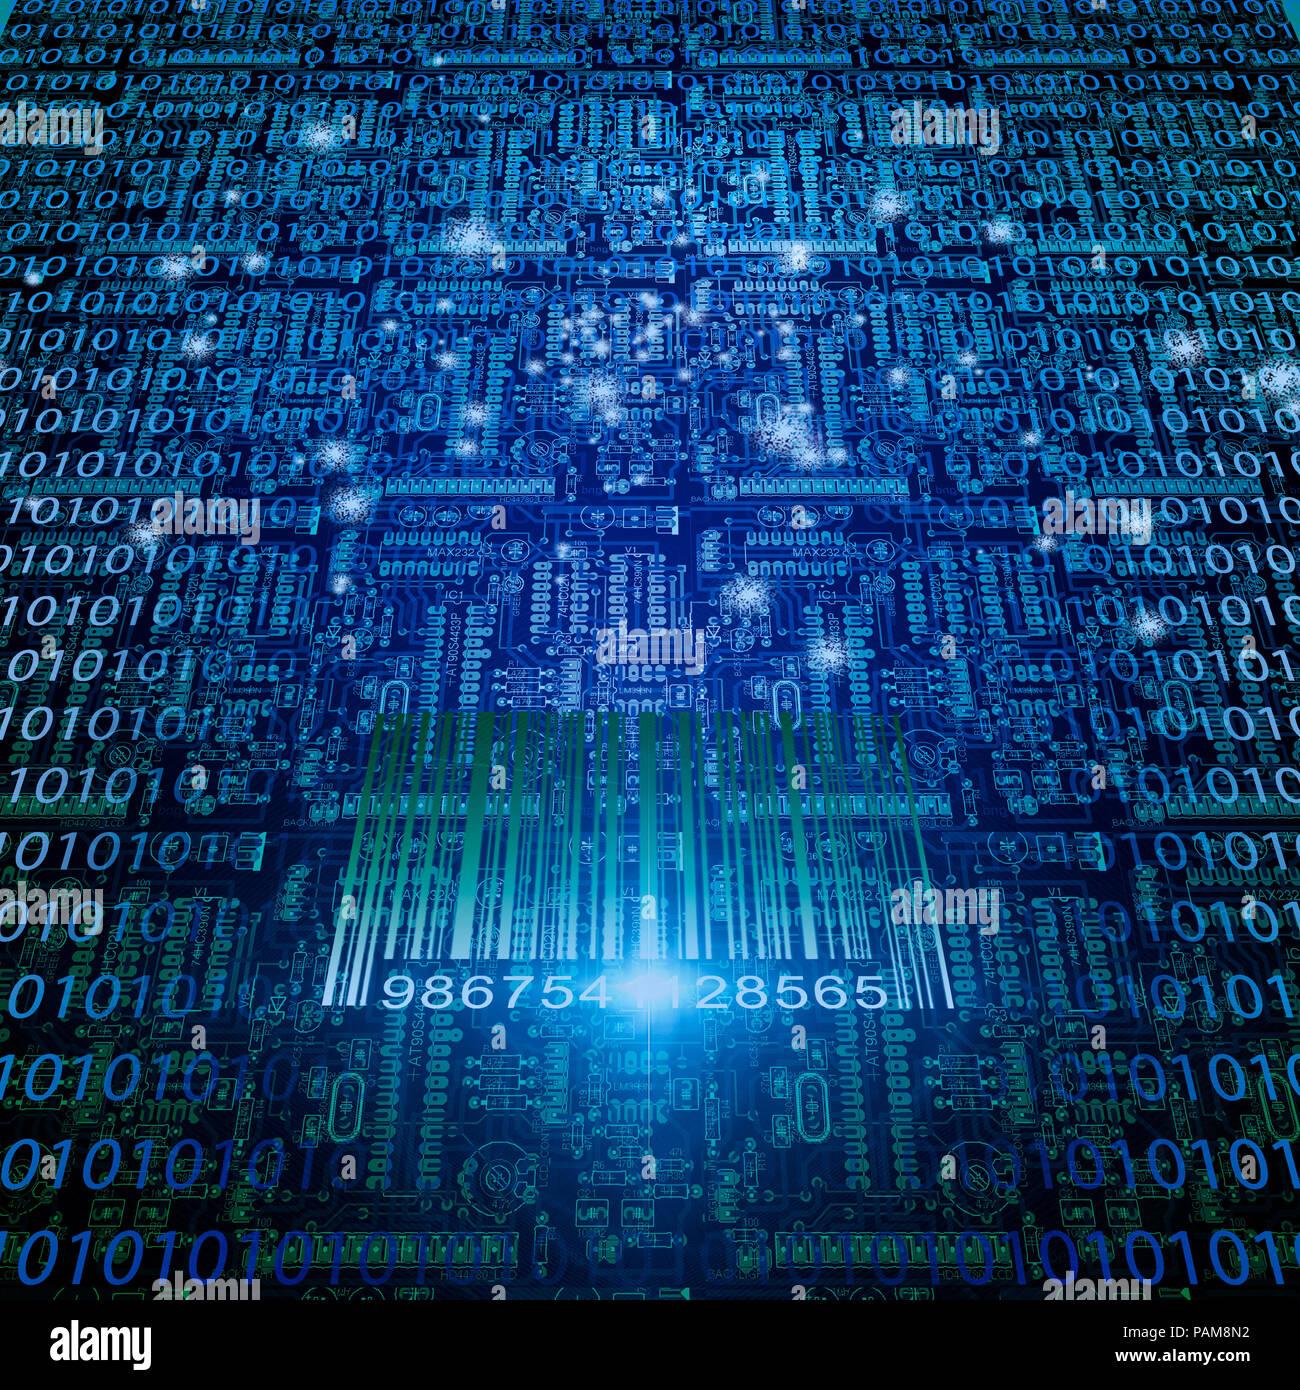 Binary code, world map and bar code. Stock Photo